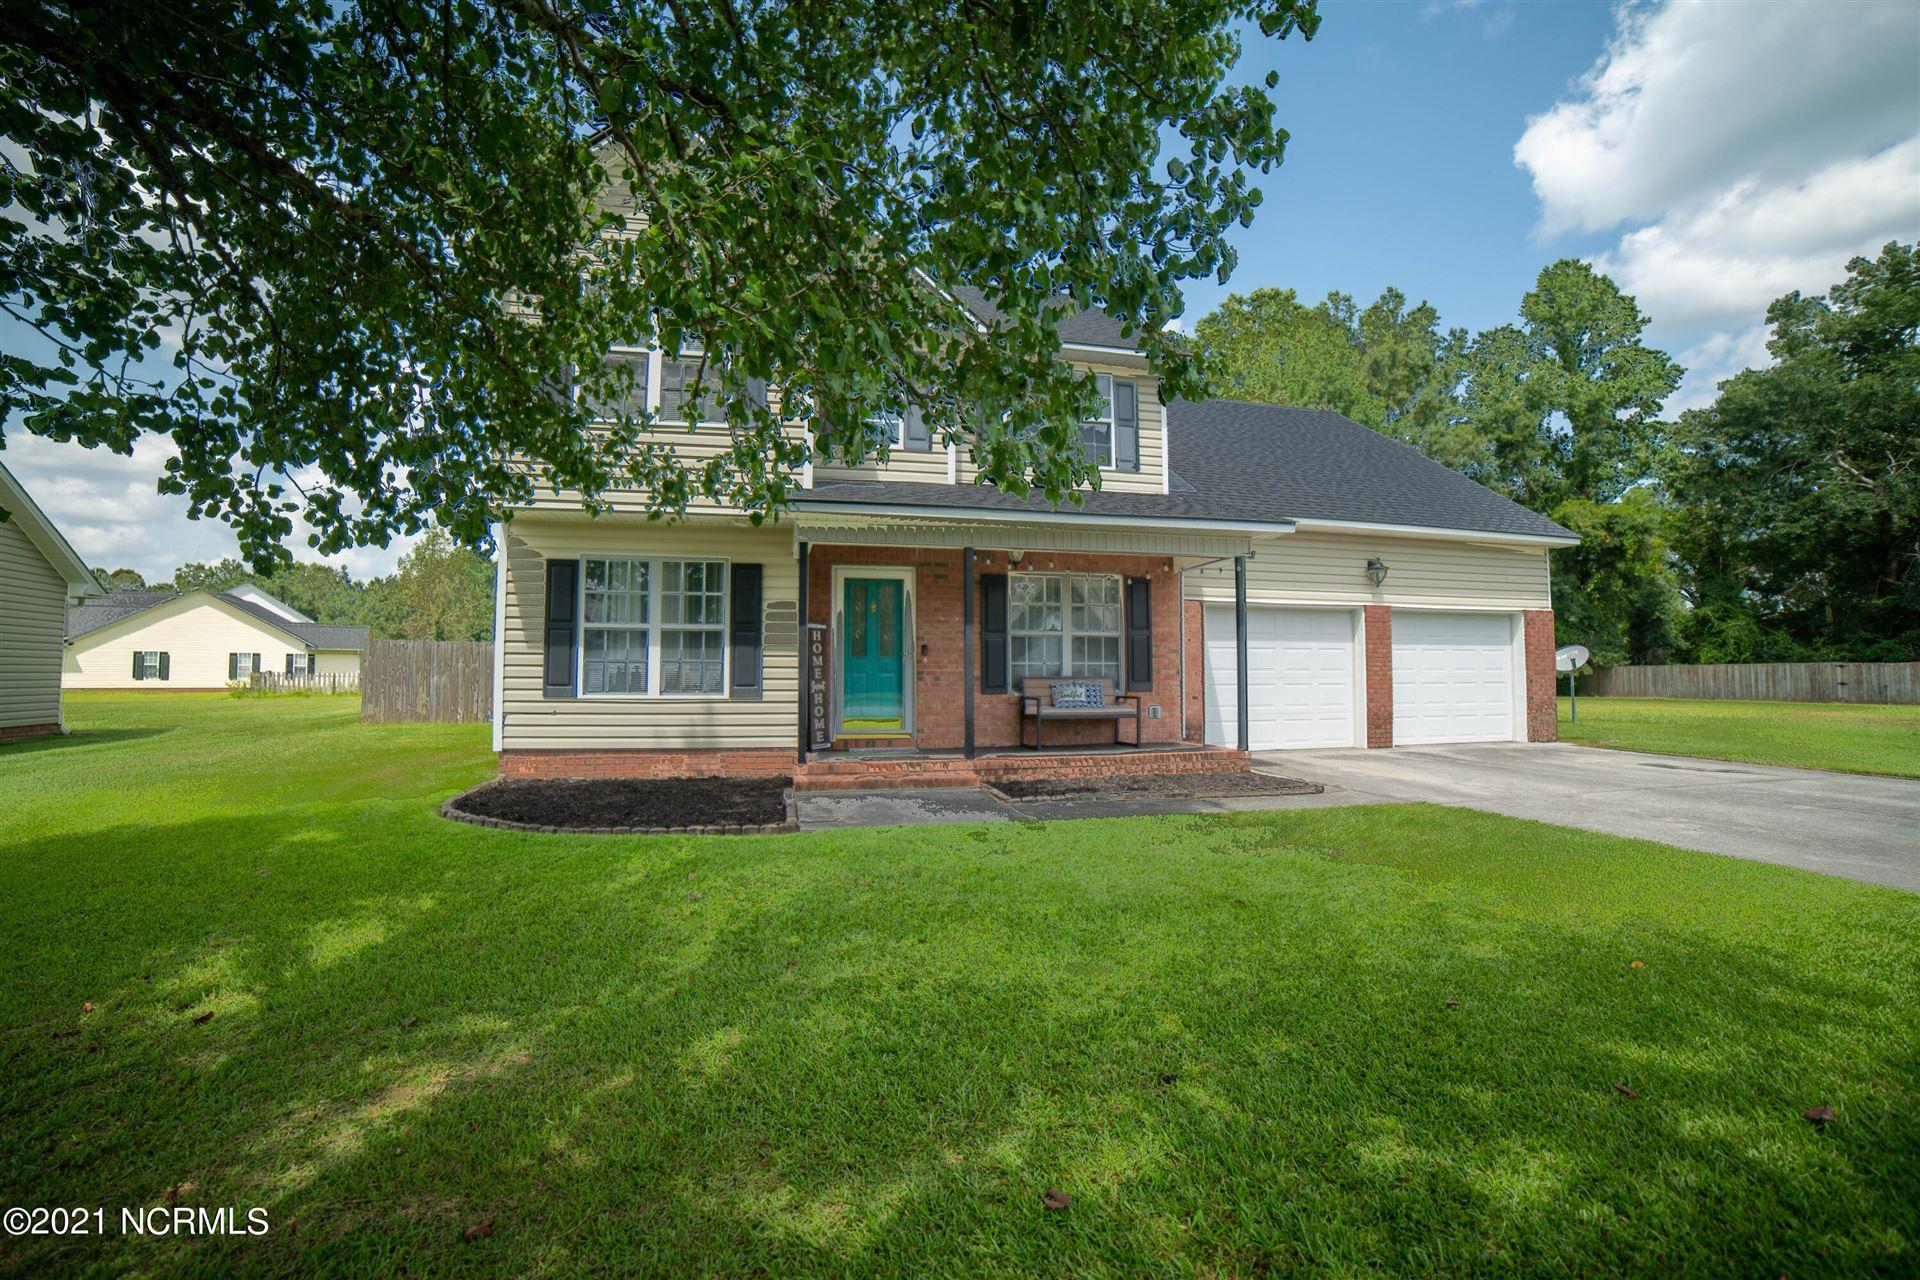 Photo of 136 Bridlewood Drive, Jacksonville, NC 28540 (MLS # 100289378)